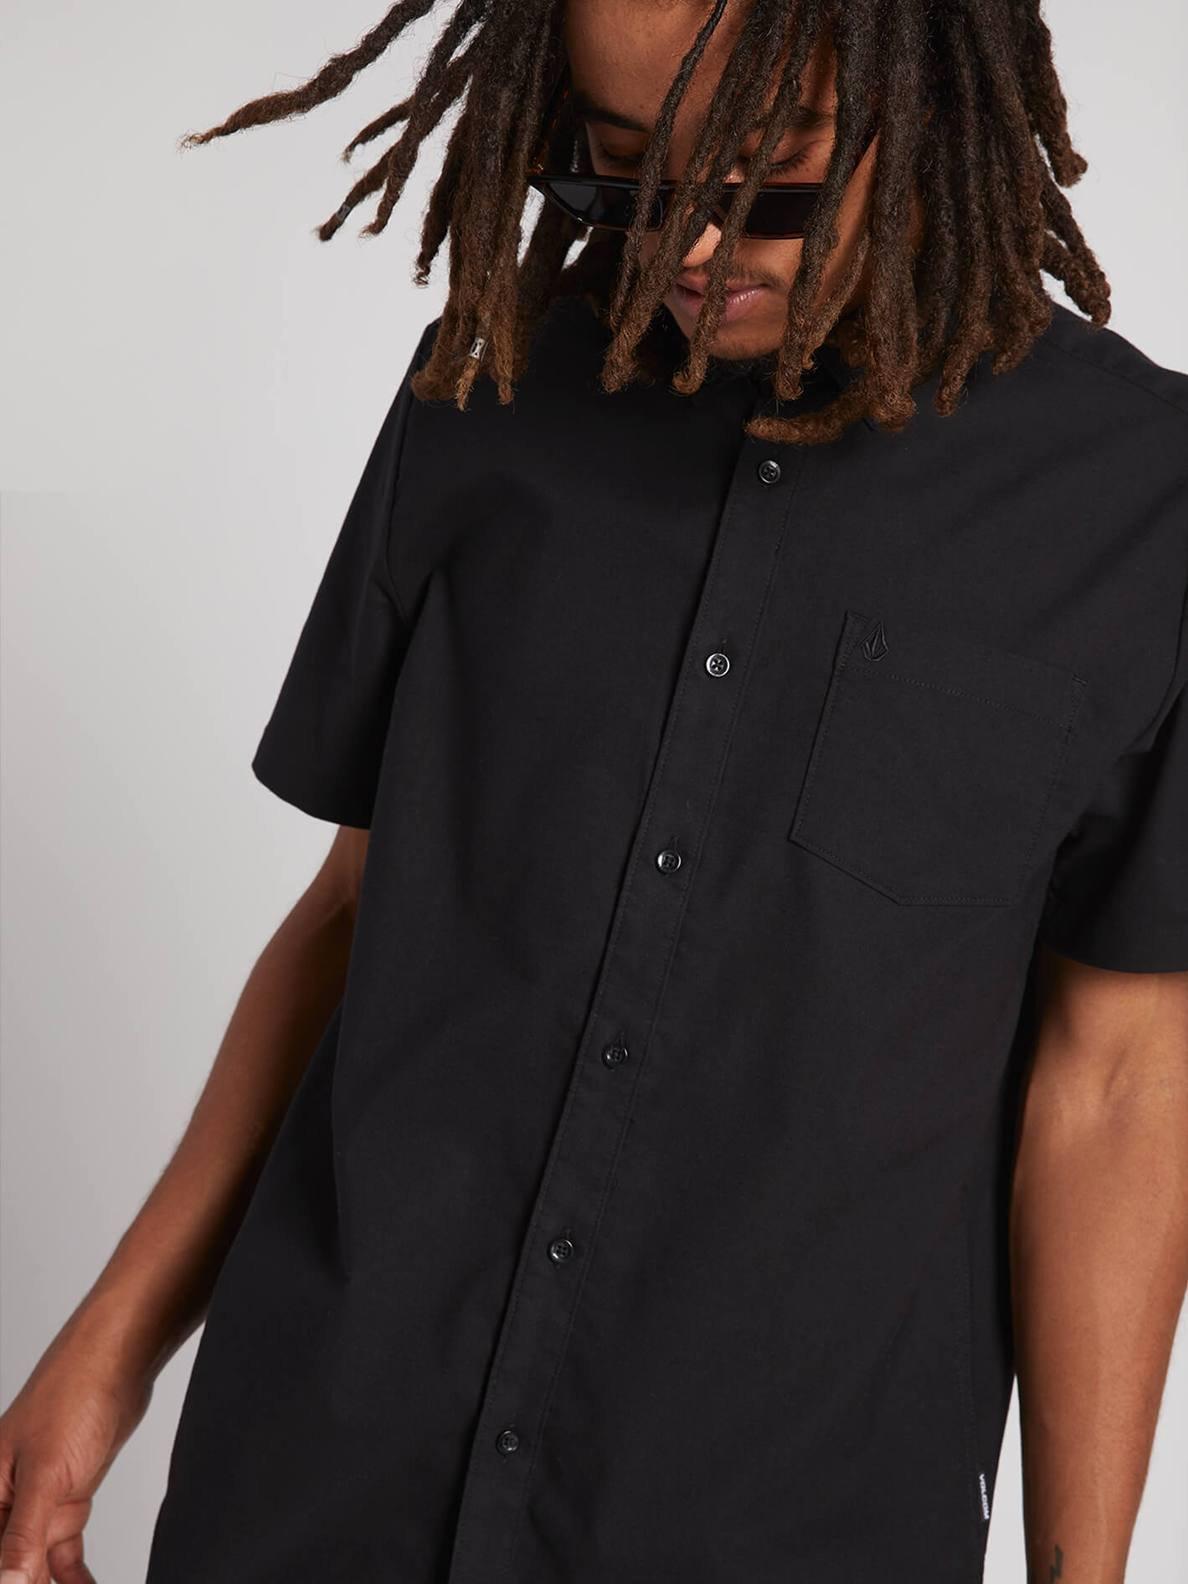 Volcom Everett Oxford Shortsleeve Shirt New Black